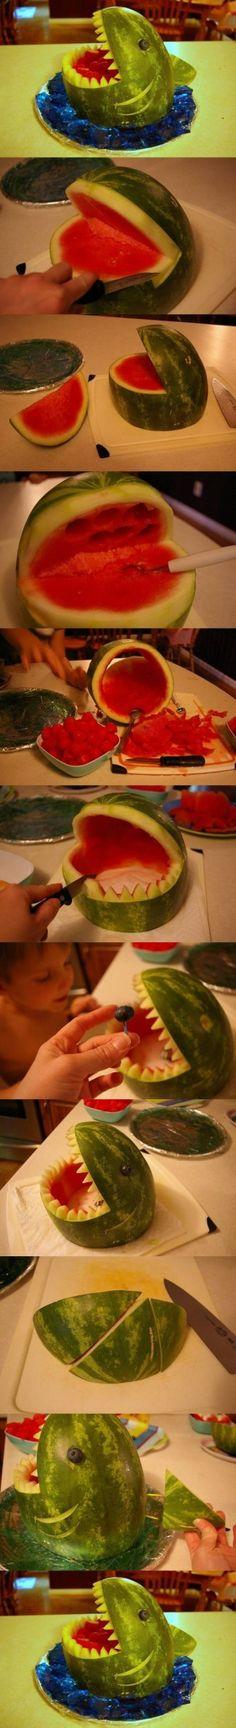 DIY Watermelon Shark Carving Internet Tutorial DIY Projects